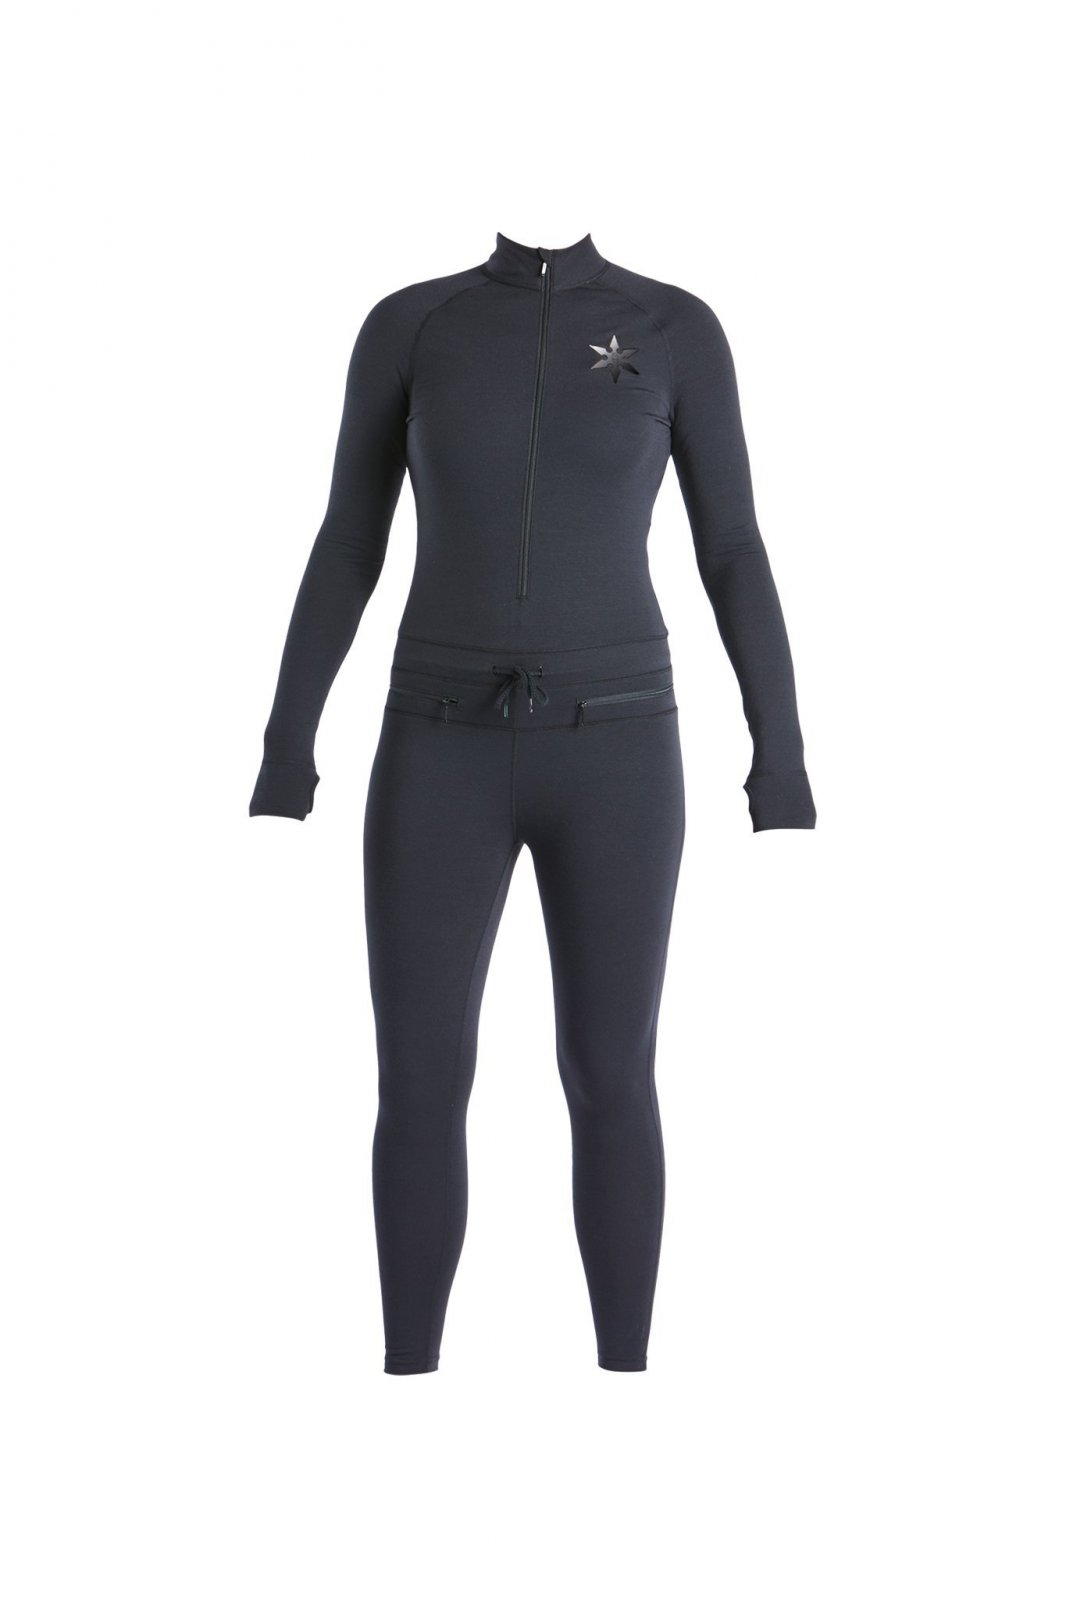 Airblaster Women's Hoodless Ninja Suit (Multiple Color Options)